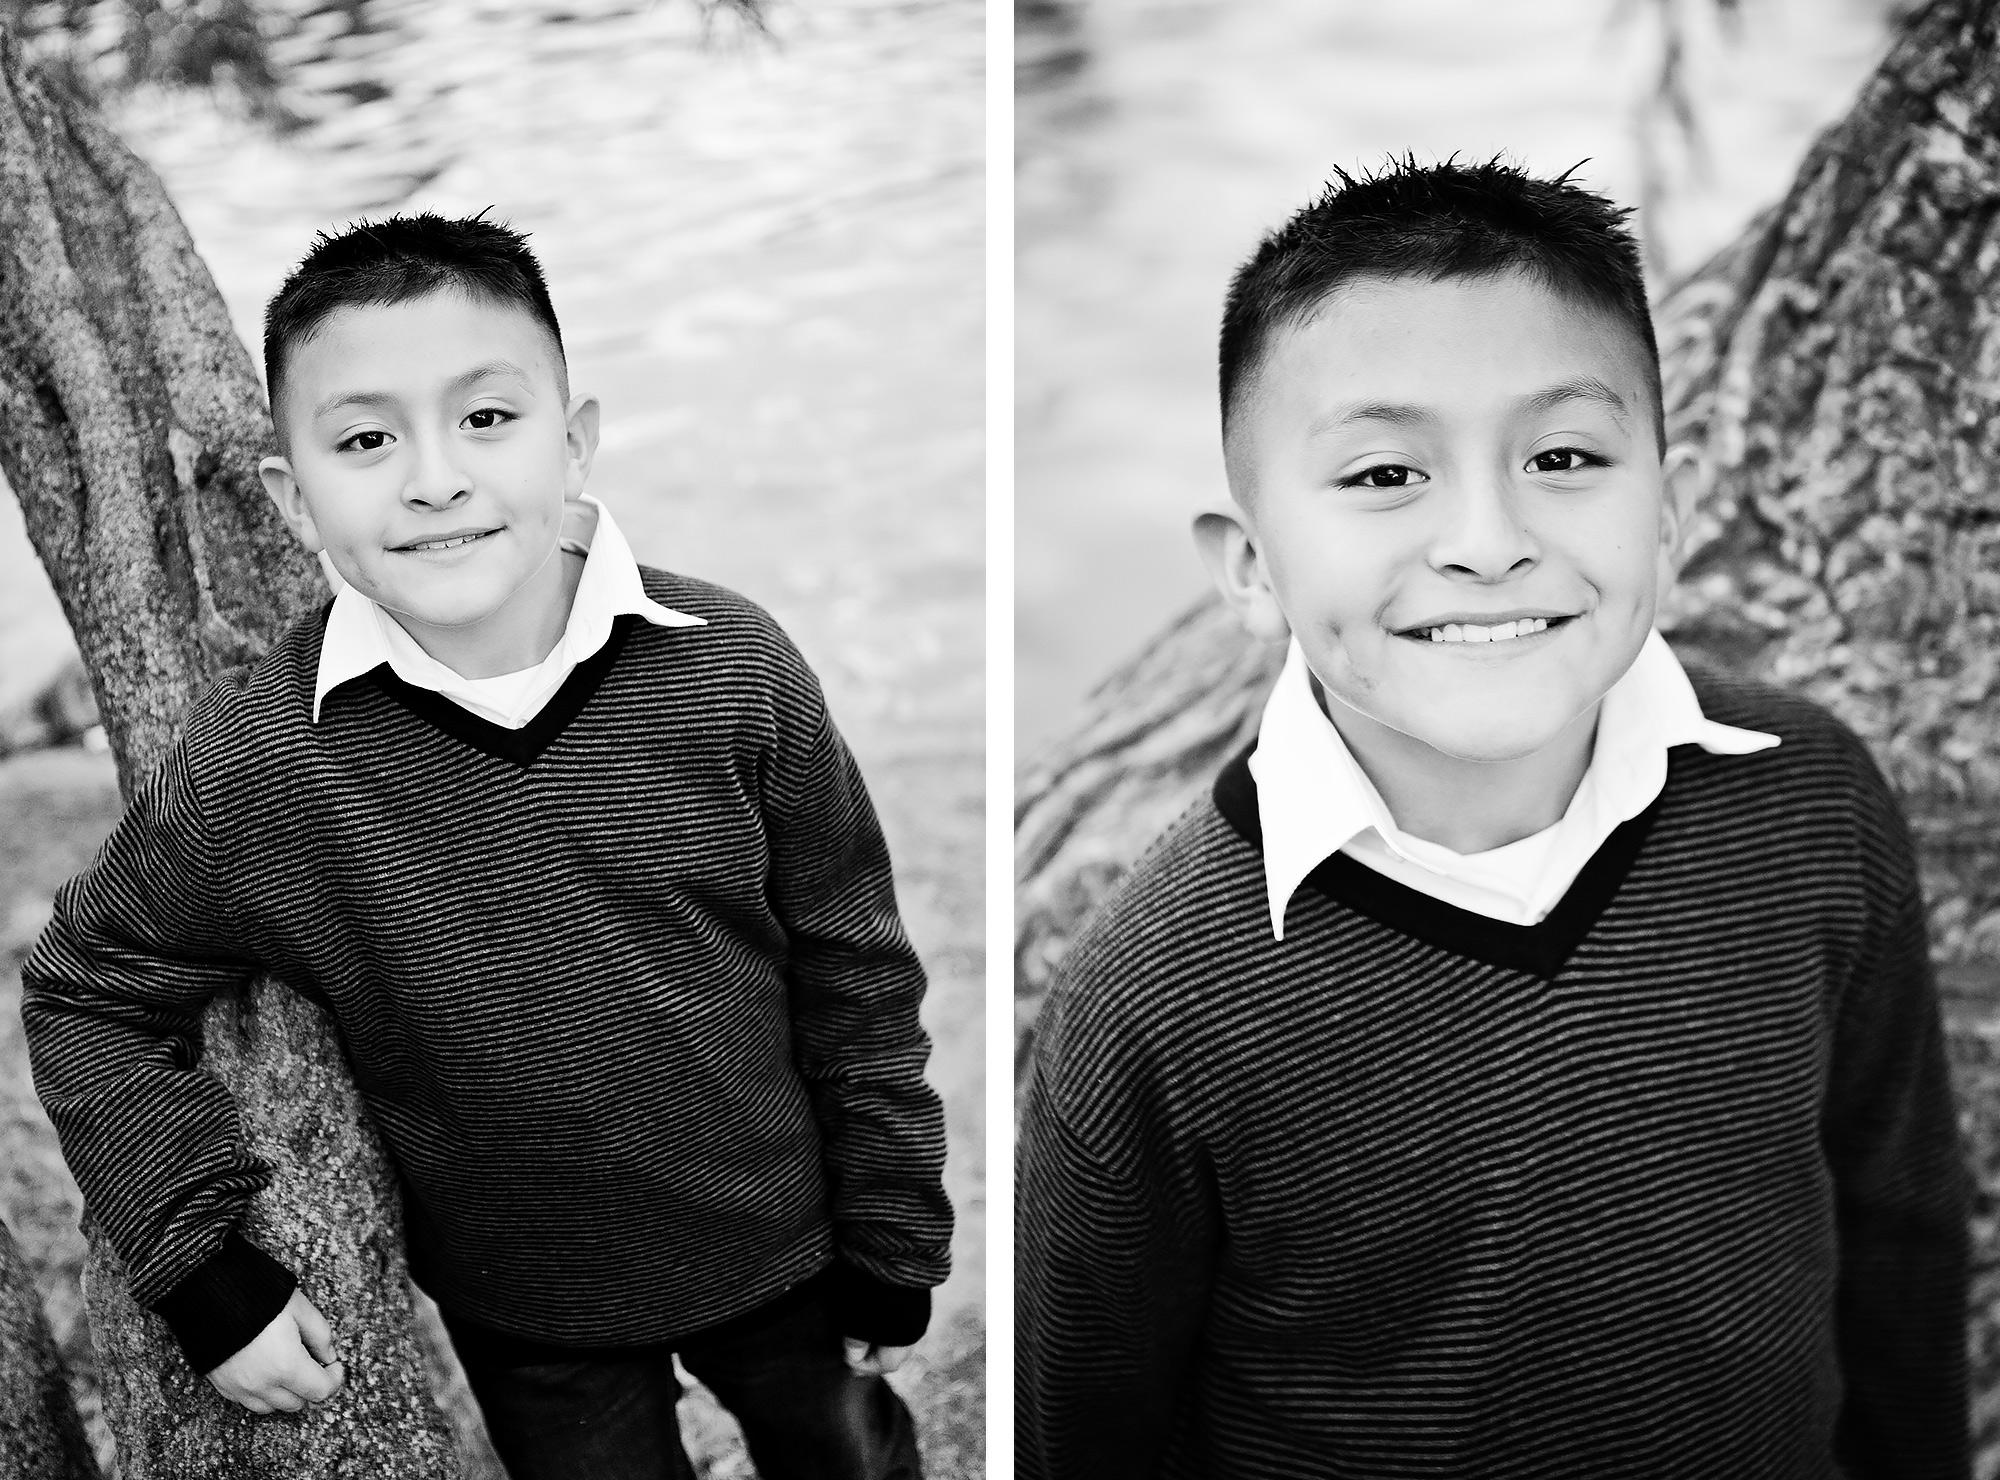 newburyport-child-portrait-photographer-stephen-grant-photography-001.jpg